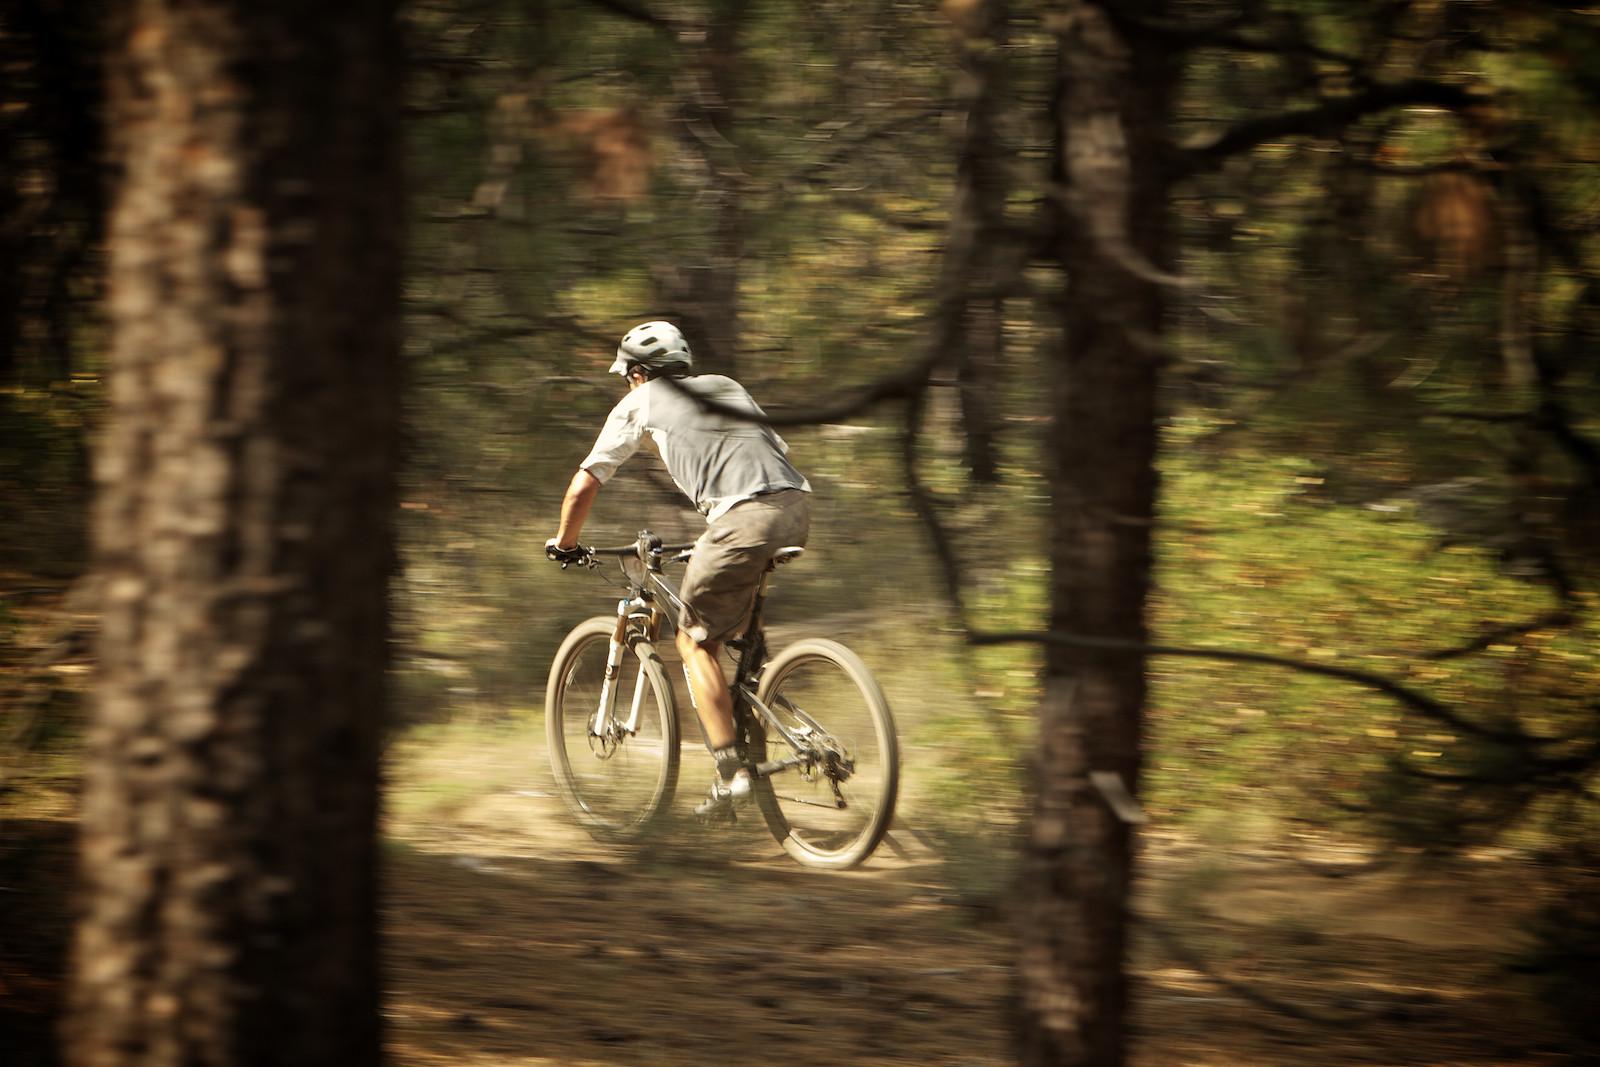 2012 Sisters Enduro Adam Craig - corytepper.com - Mountain Biking Pictures - Vital MTB